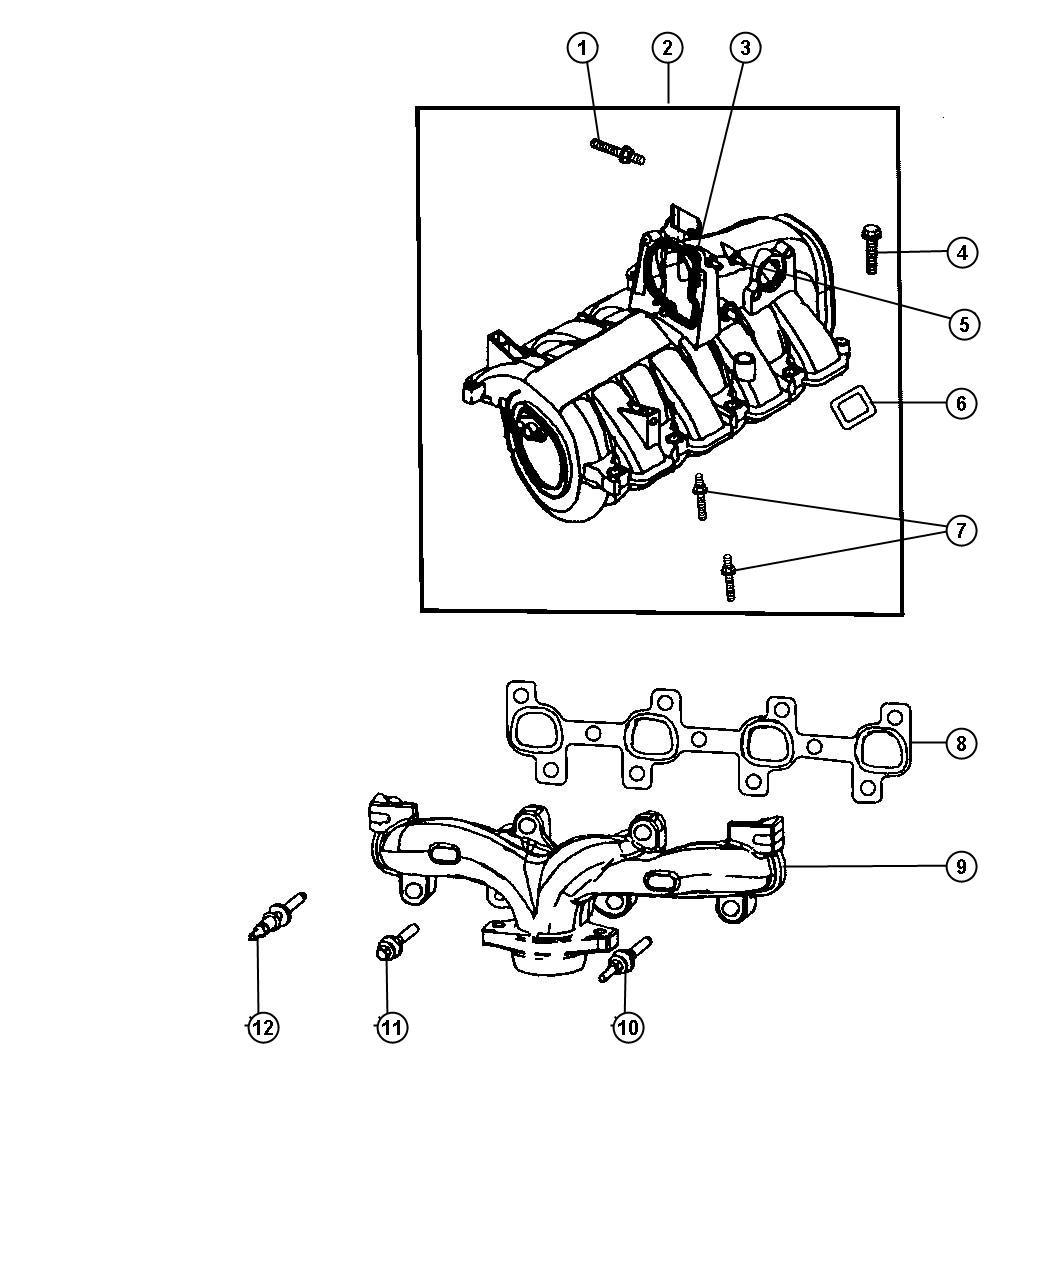 Dodge Ram Manifold Exhaust Right Mpiengine